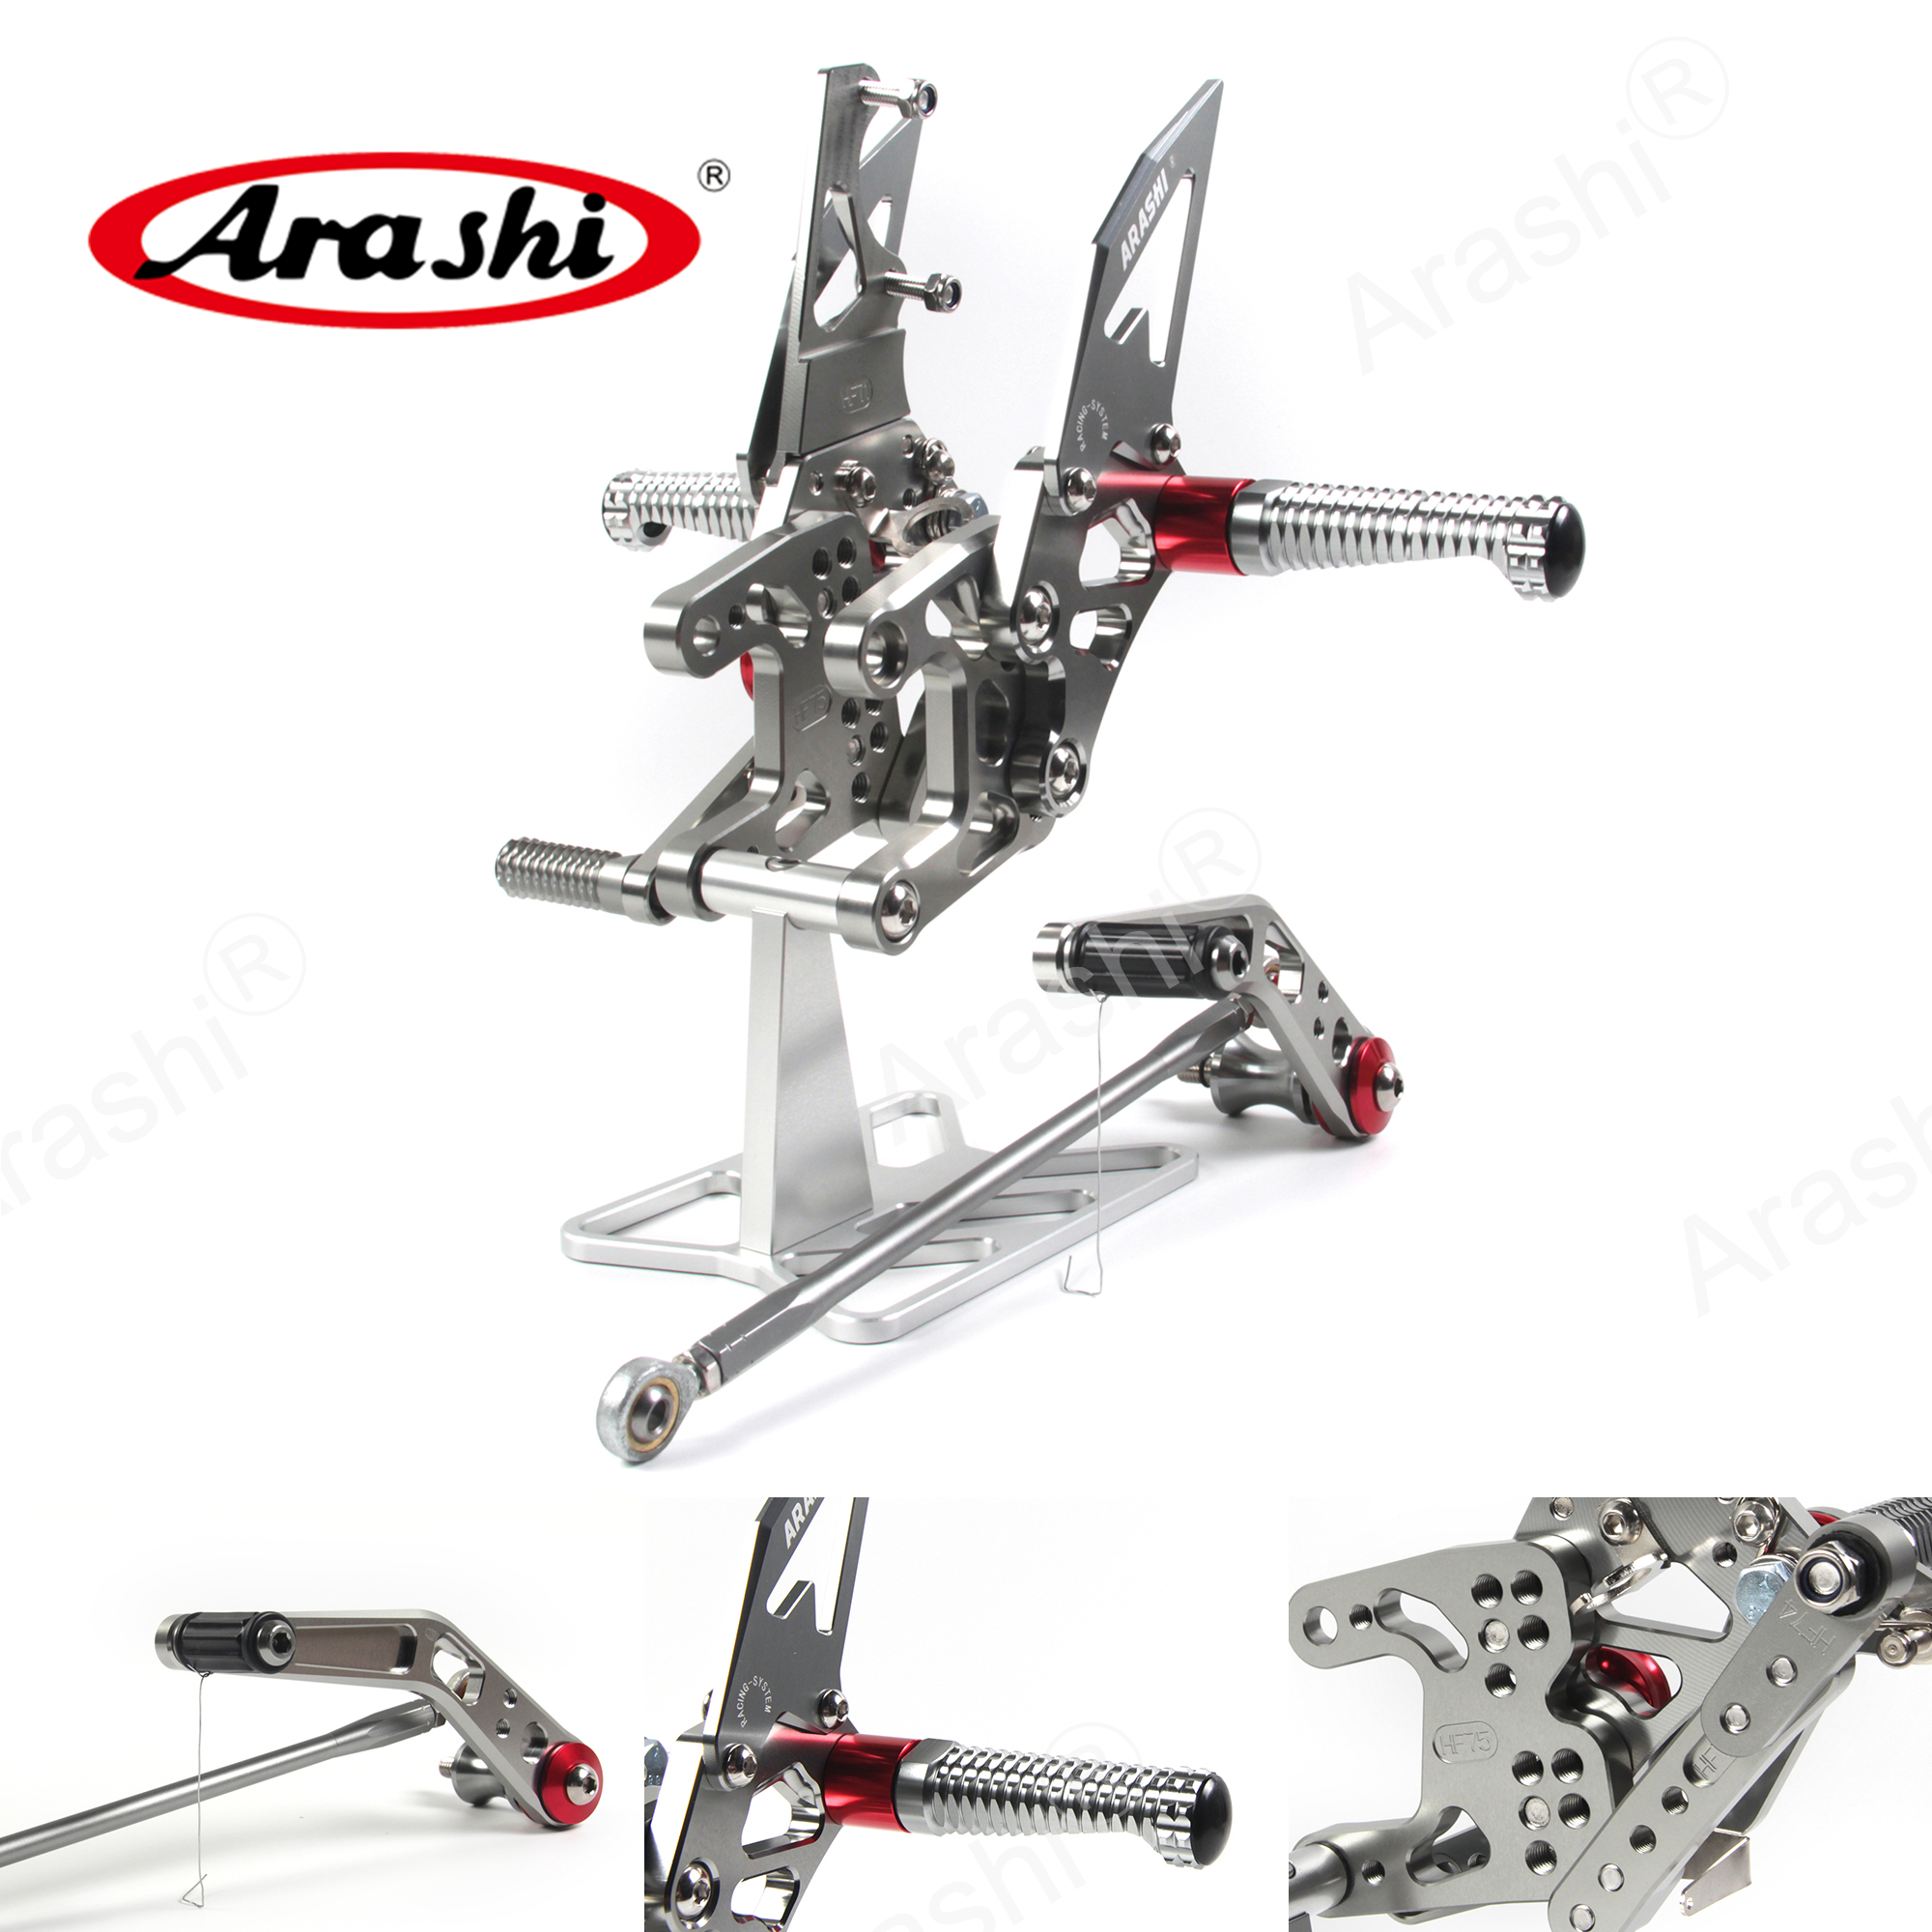 Arashi CBR1000RR 2008 - 2011 CNC Adjustable Footrest Rearsets For HONDA CBR1000 RR 2009 2010 11 10 09 08 1000RR Aluminum Silver